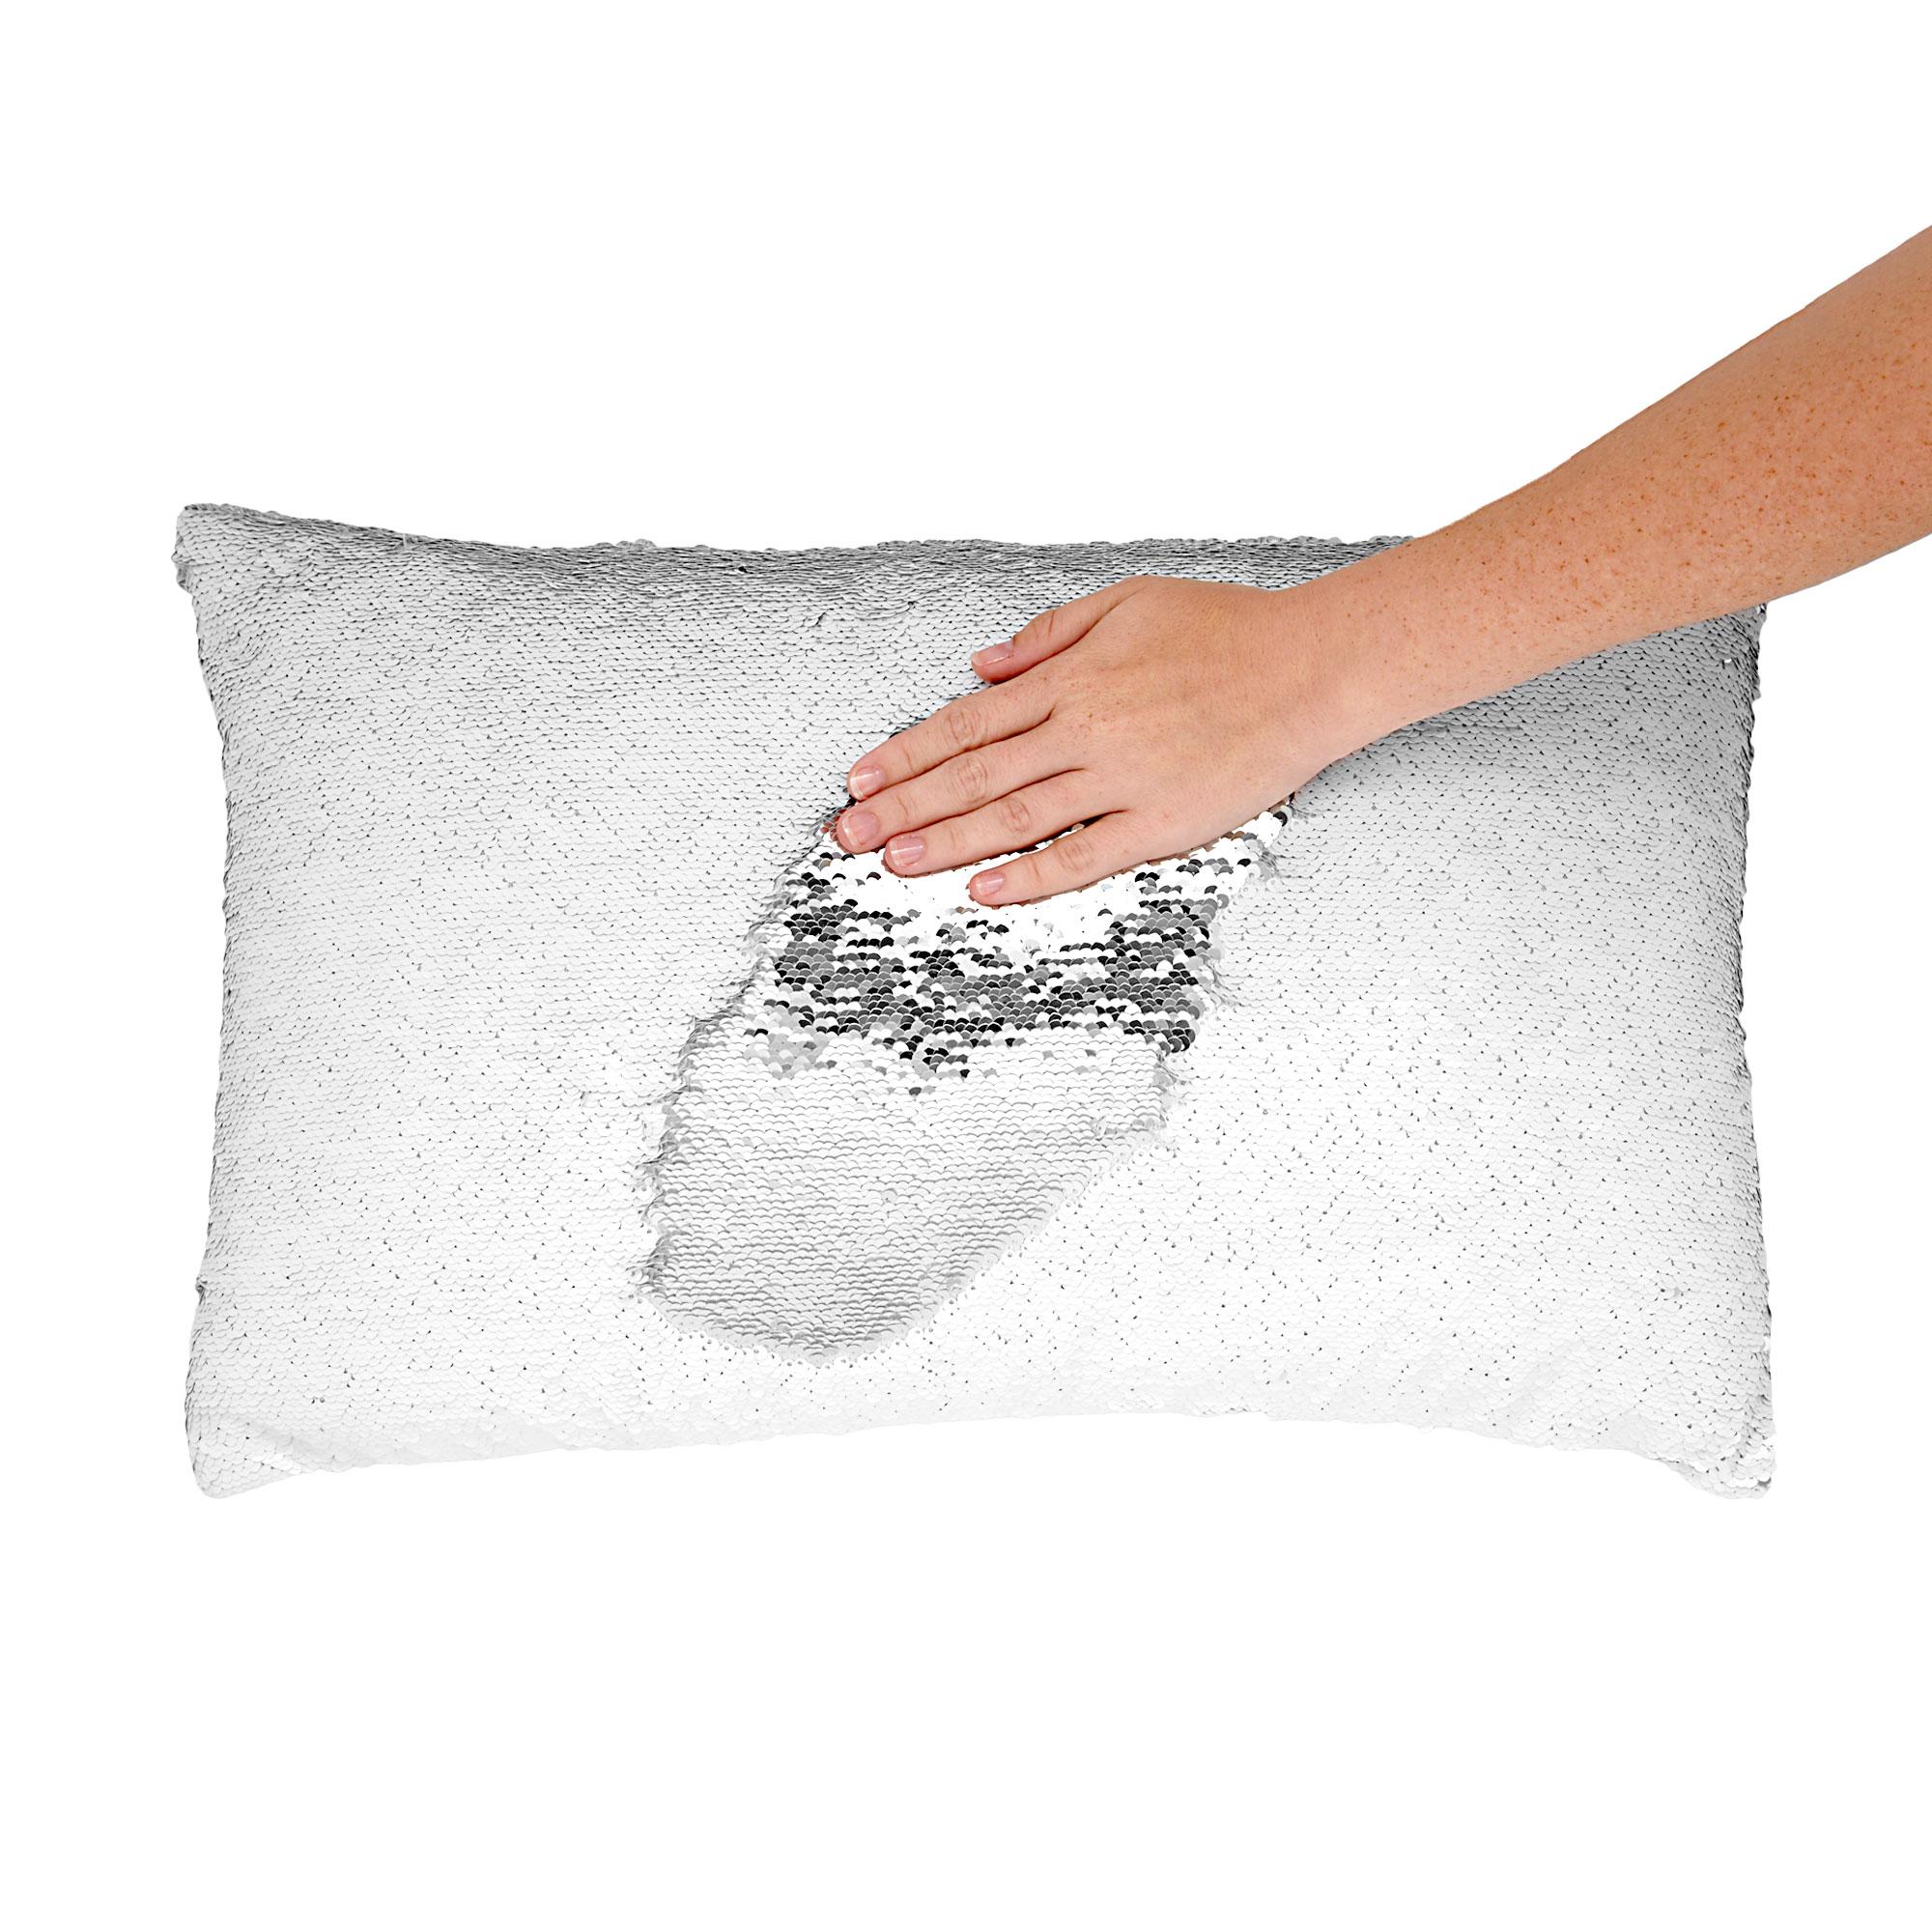 Fabulous Mermaid Kussen / Pillow De styling musthave van 2016 SZ17